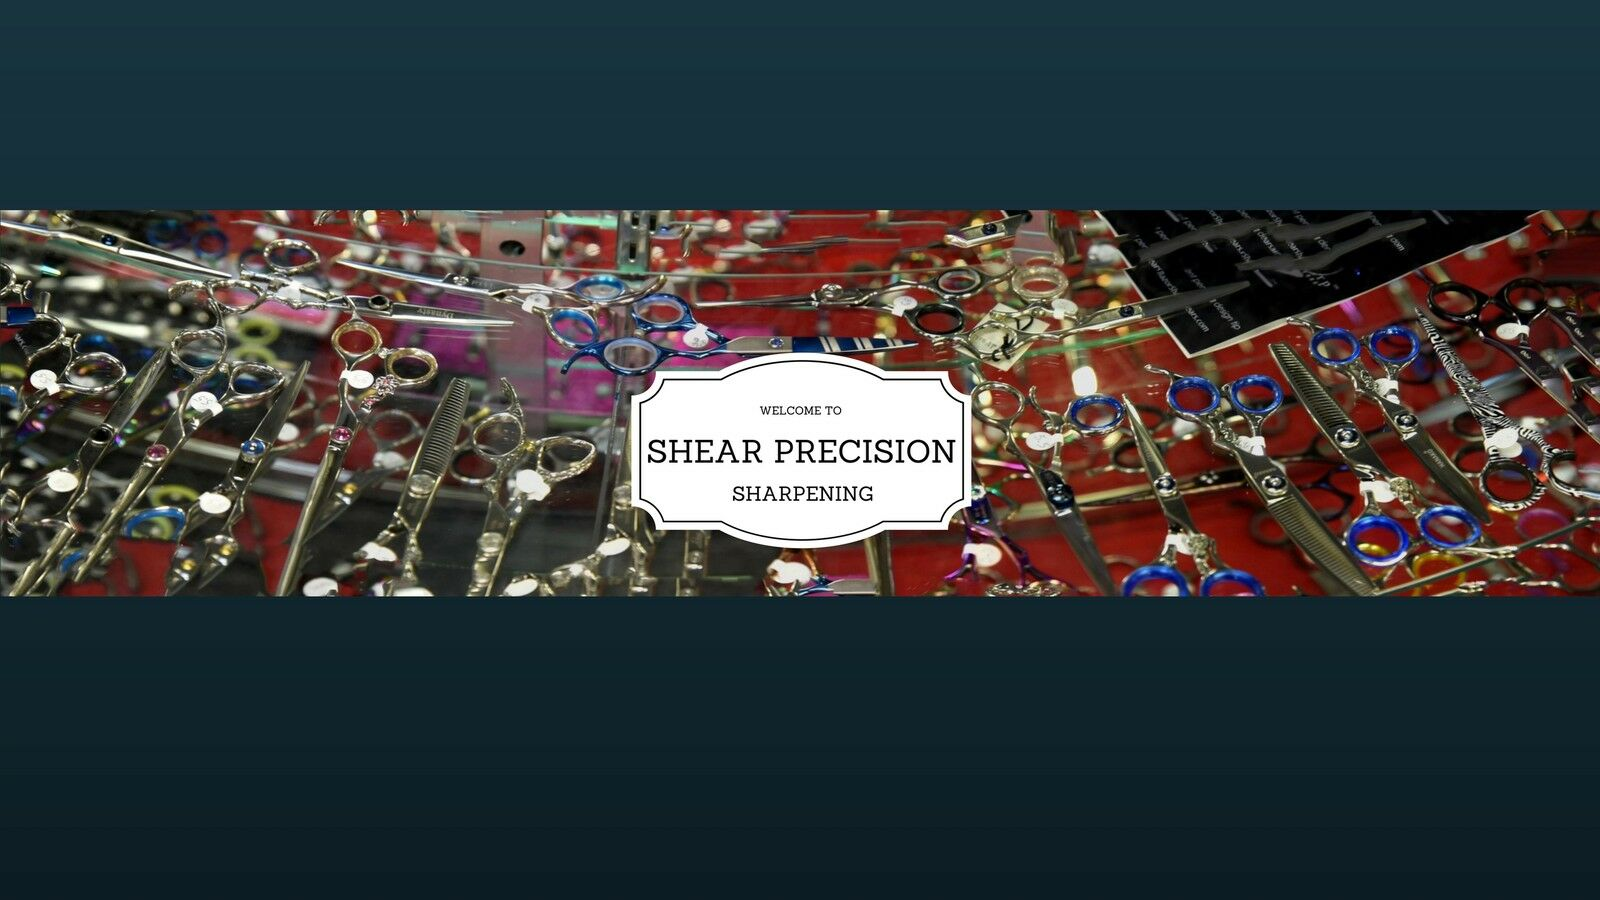 Shear Precision Sharpening